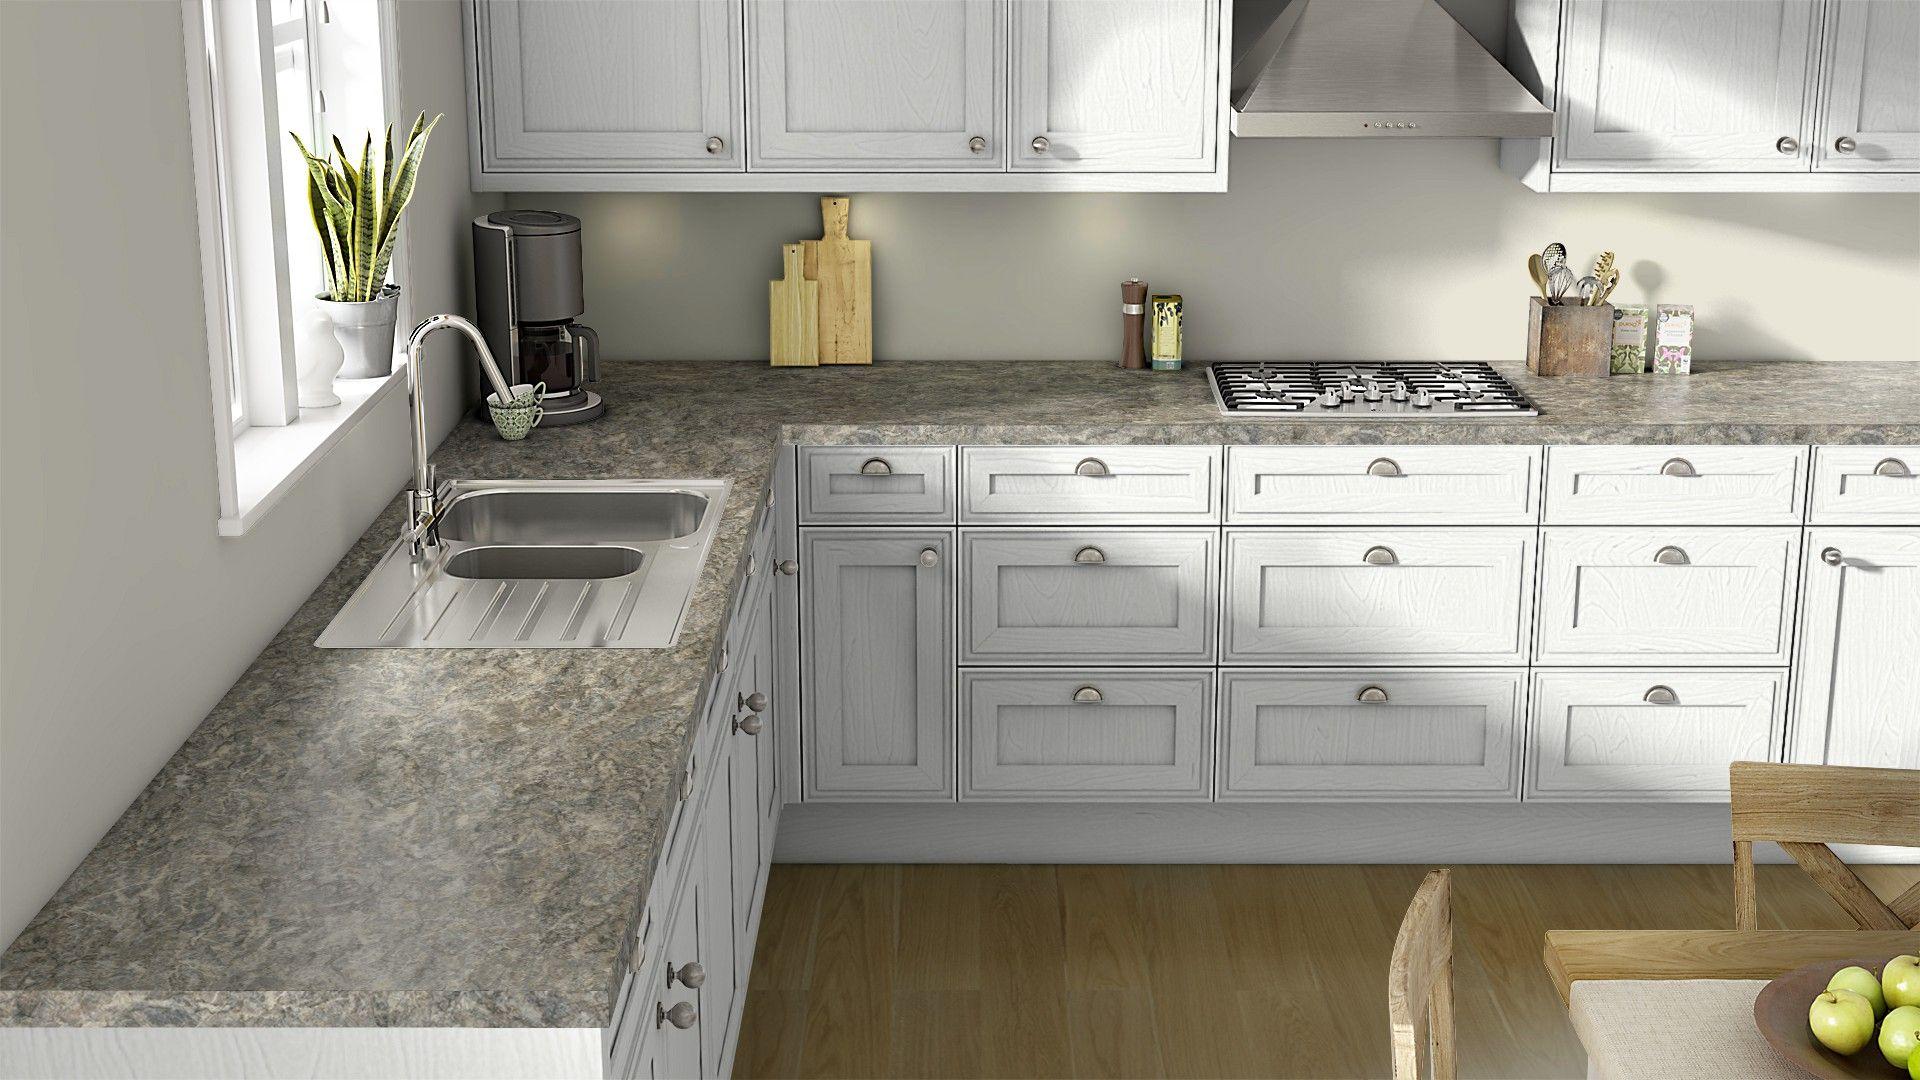 Cafe De Pesco Kitchen Remodel Laminate Countertops